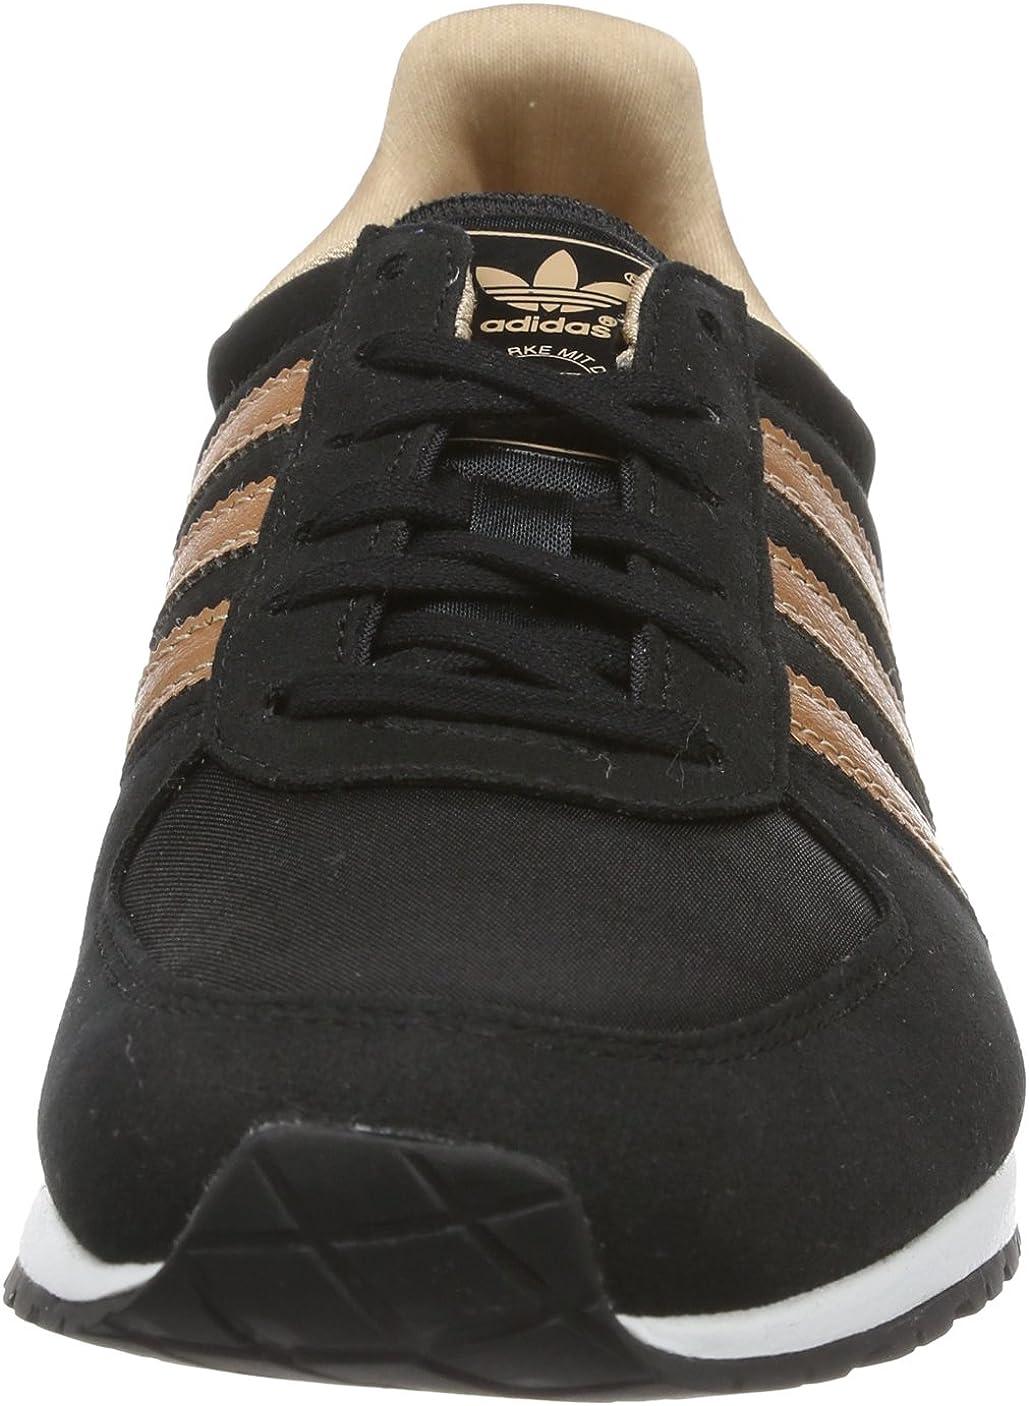 adidas Originals Adistar Racer W 3 D65483 Damen Sneaker